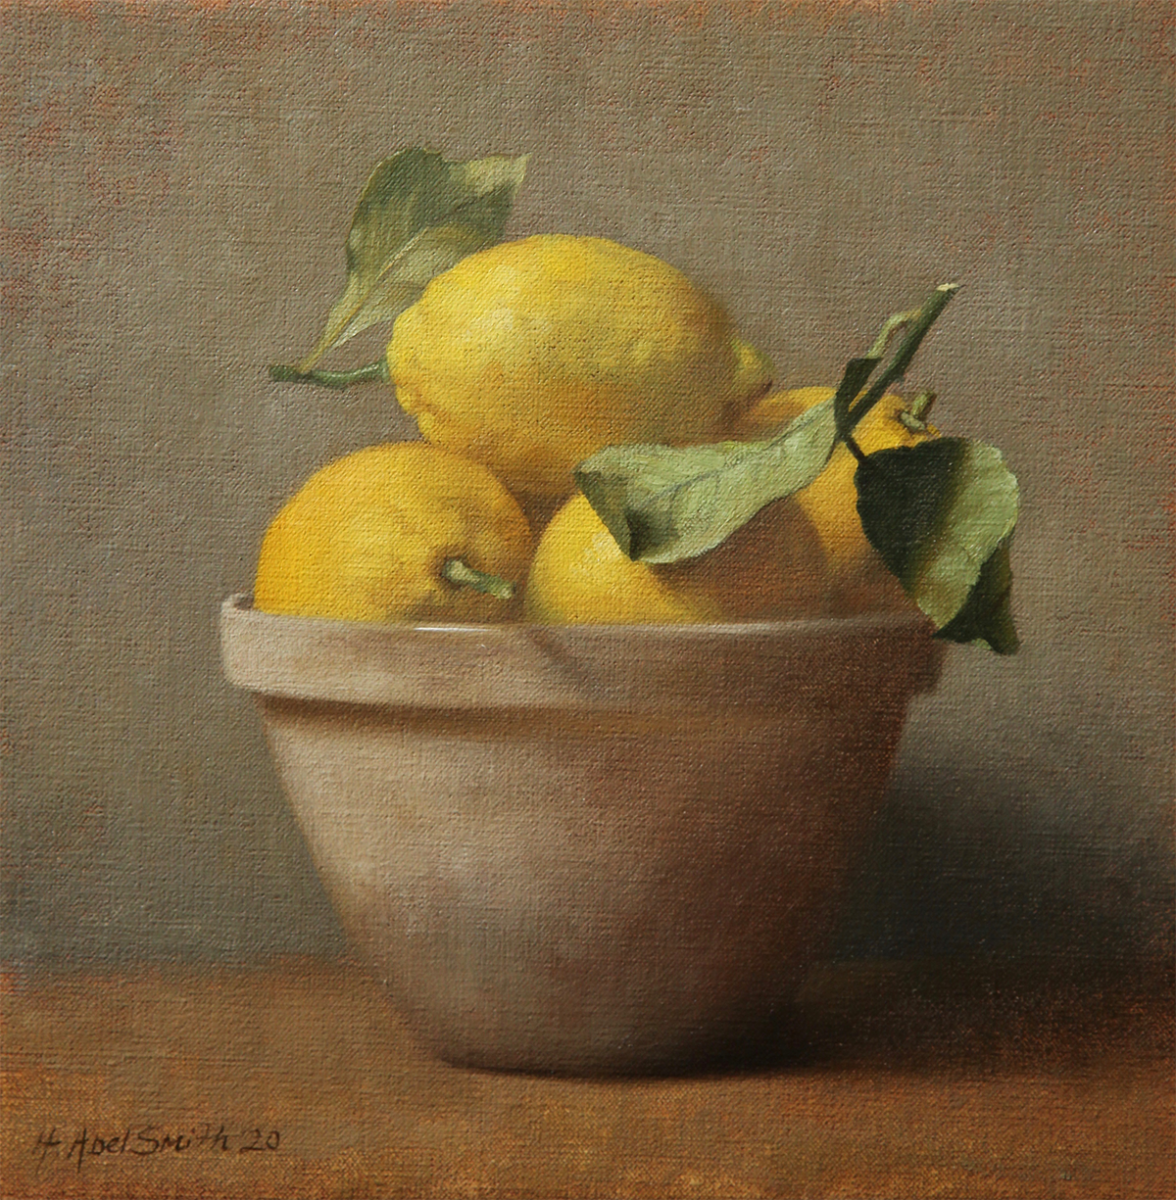 "HENRIETTA ABEL SMITH | Bowl of Lemons | OIL ON CANVAS | 12 x 12 inches | £1250<br /><a class=""buy-button"" href=""mailto:info@dacre-art.com?subject=Website%20Enquiry"">Enquire</a>"